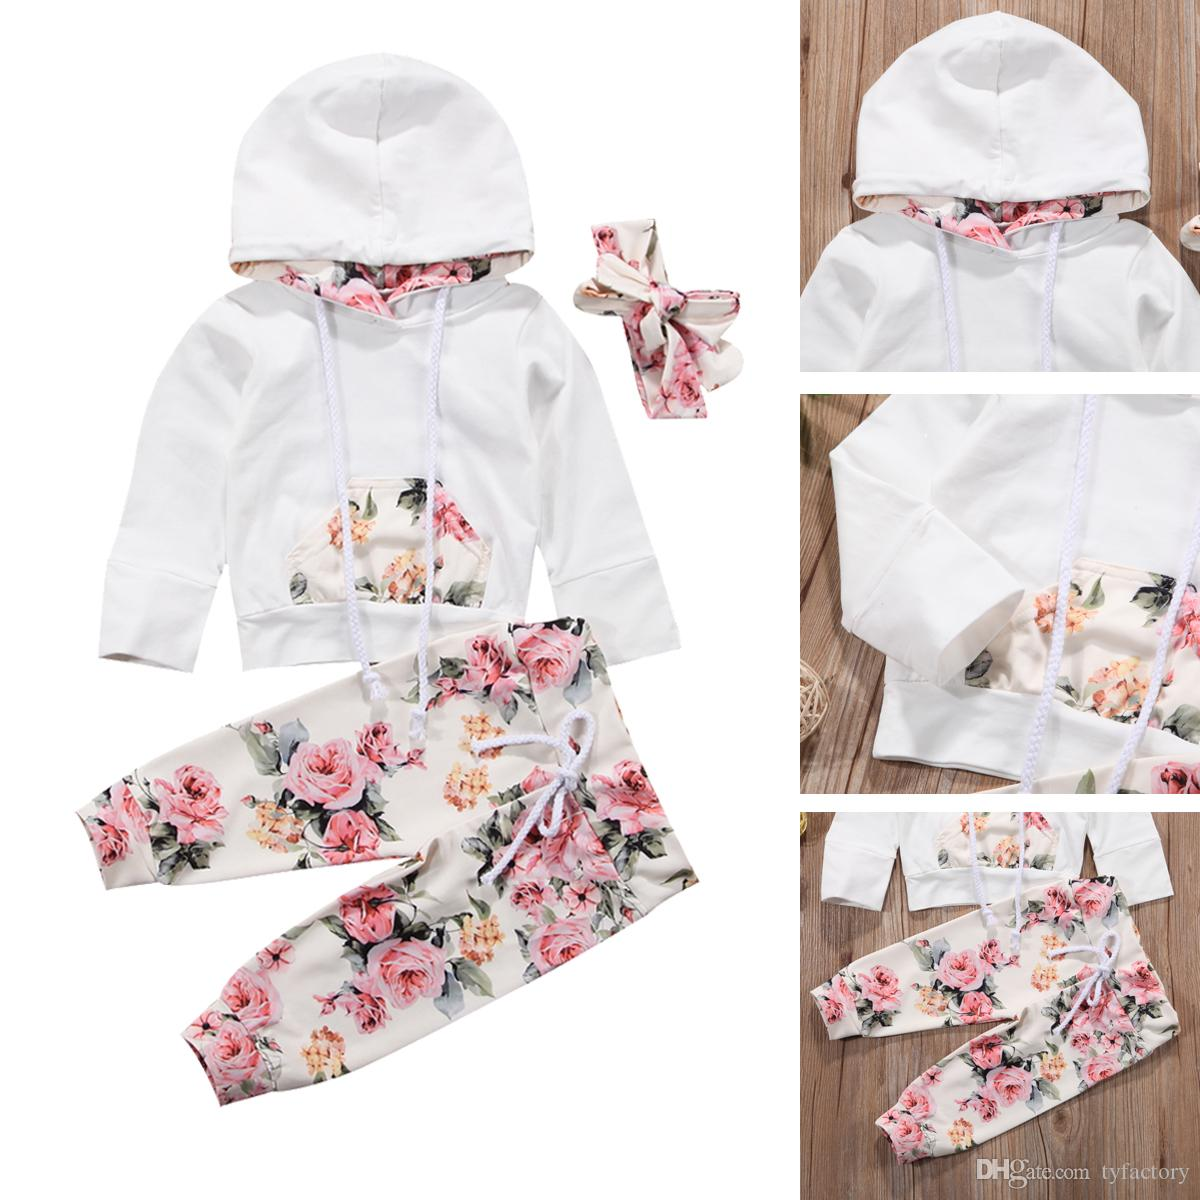 979c57d49 2019 New Baby Infant Girls Clothing Set Flower Long Sleeve Hooded ...